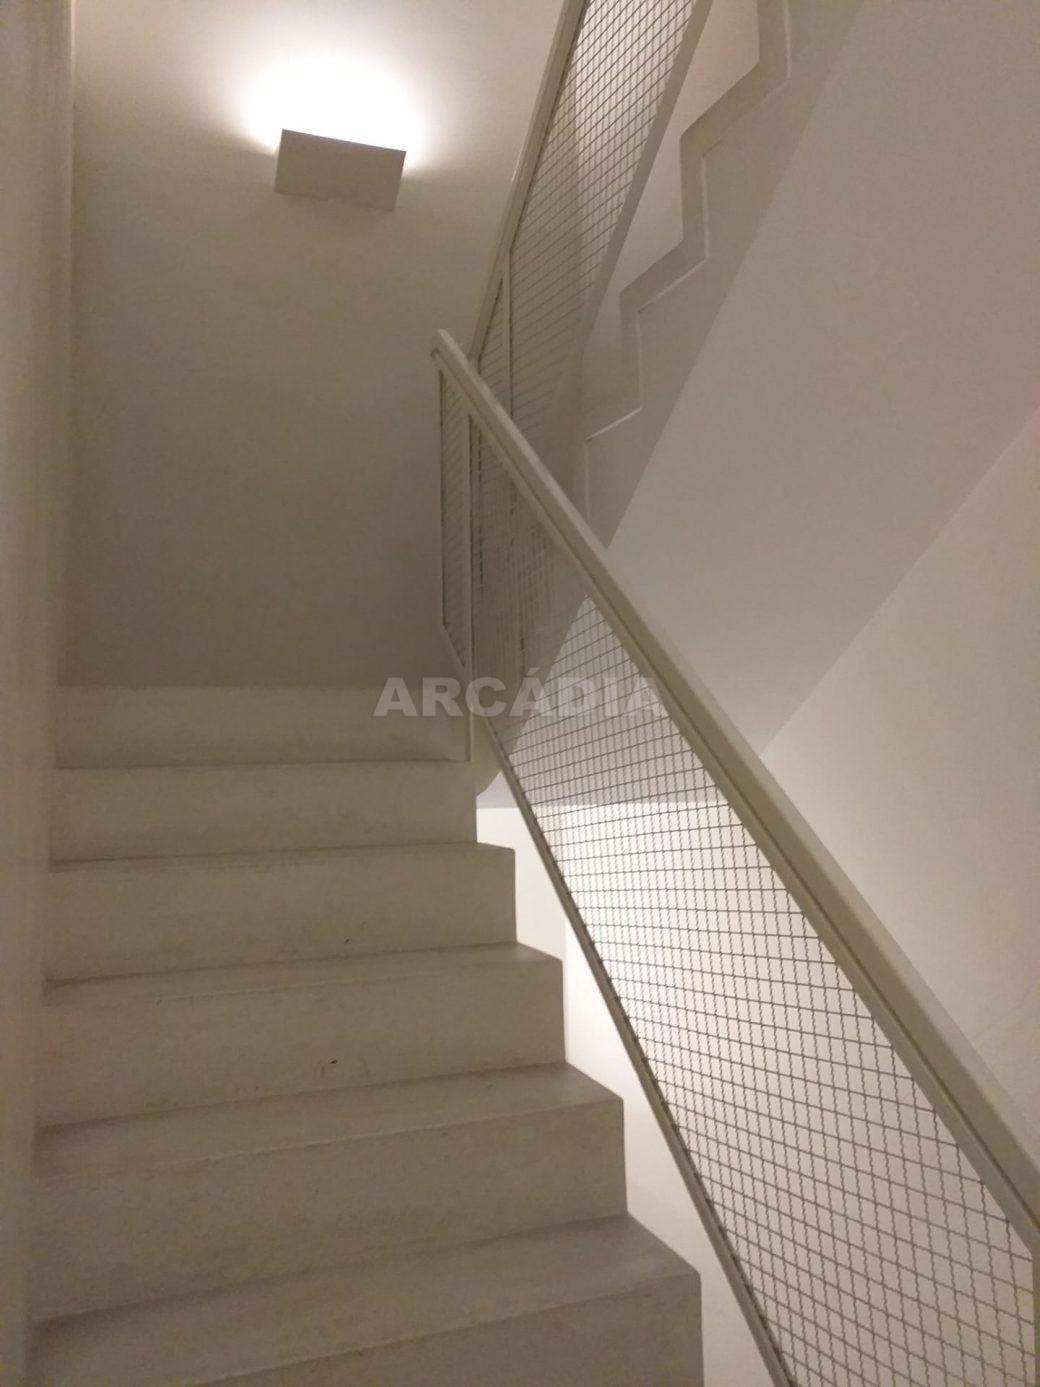 arcadia-imobiliaria-braga-apartamento-no-centro-historico-de-braga-tipo-2-para-compra-35